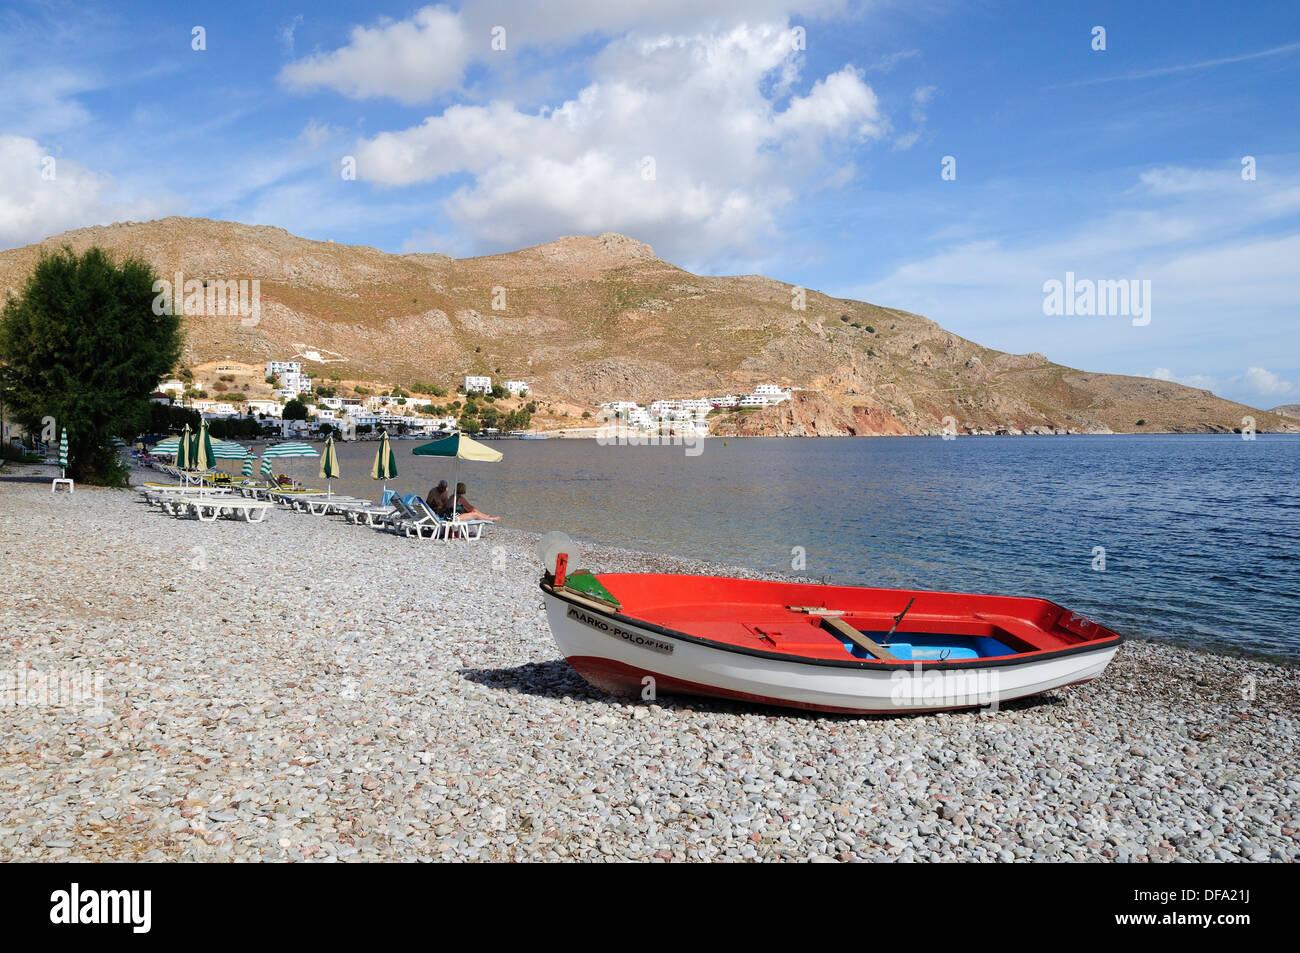 Livadia Strand Tilos griechische Insel der Dodekanes-Griechenland Stockbild